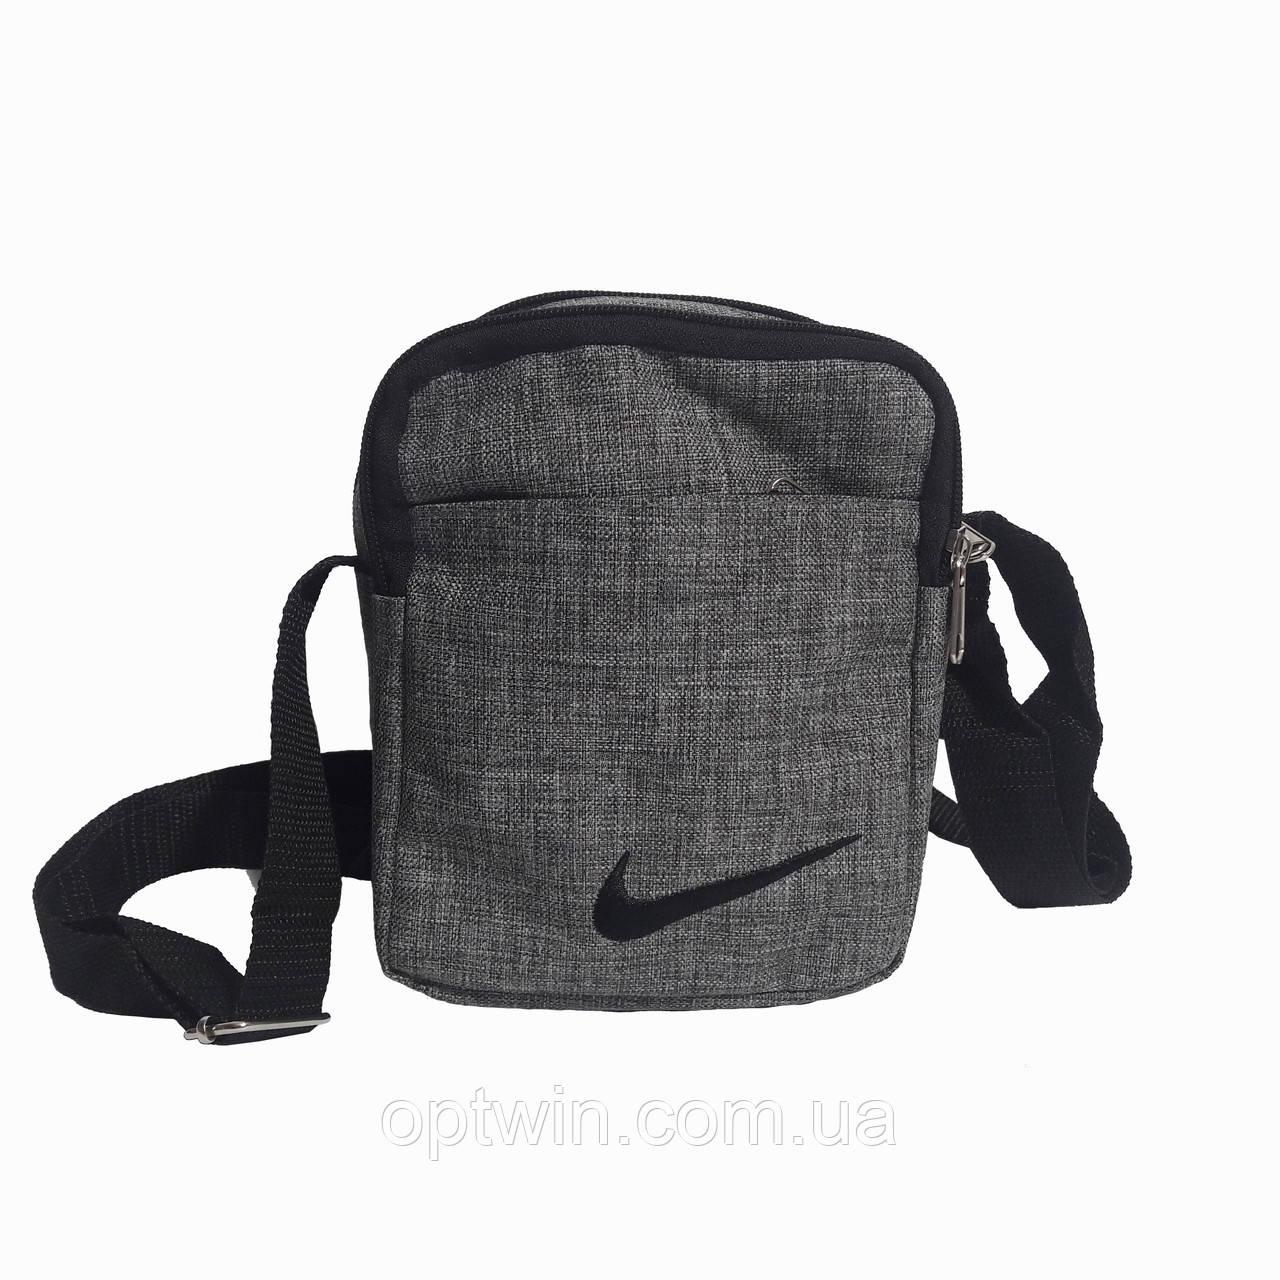 Сумка на плечо, барсетка Nike серая, на 4 отделения (реплика), фото 1